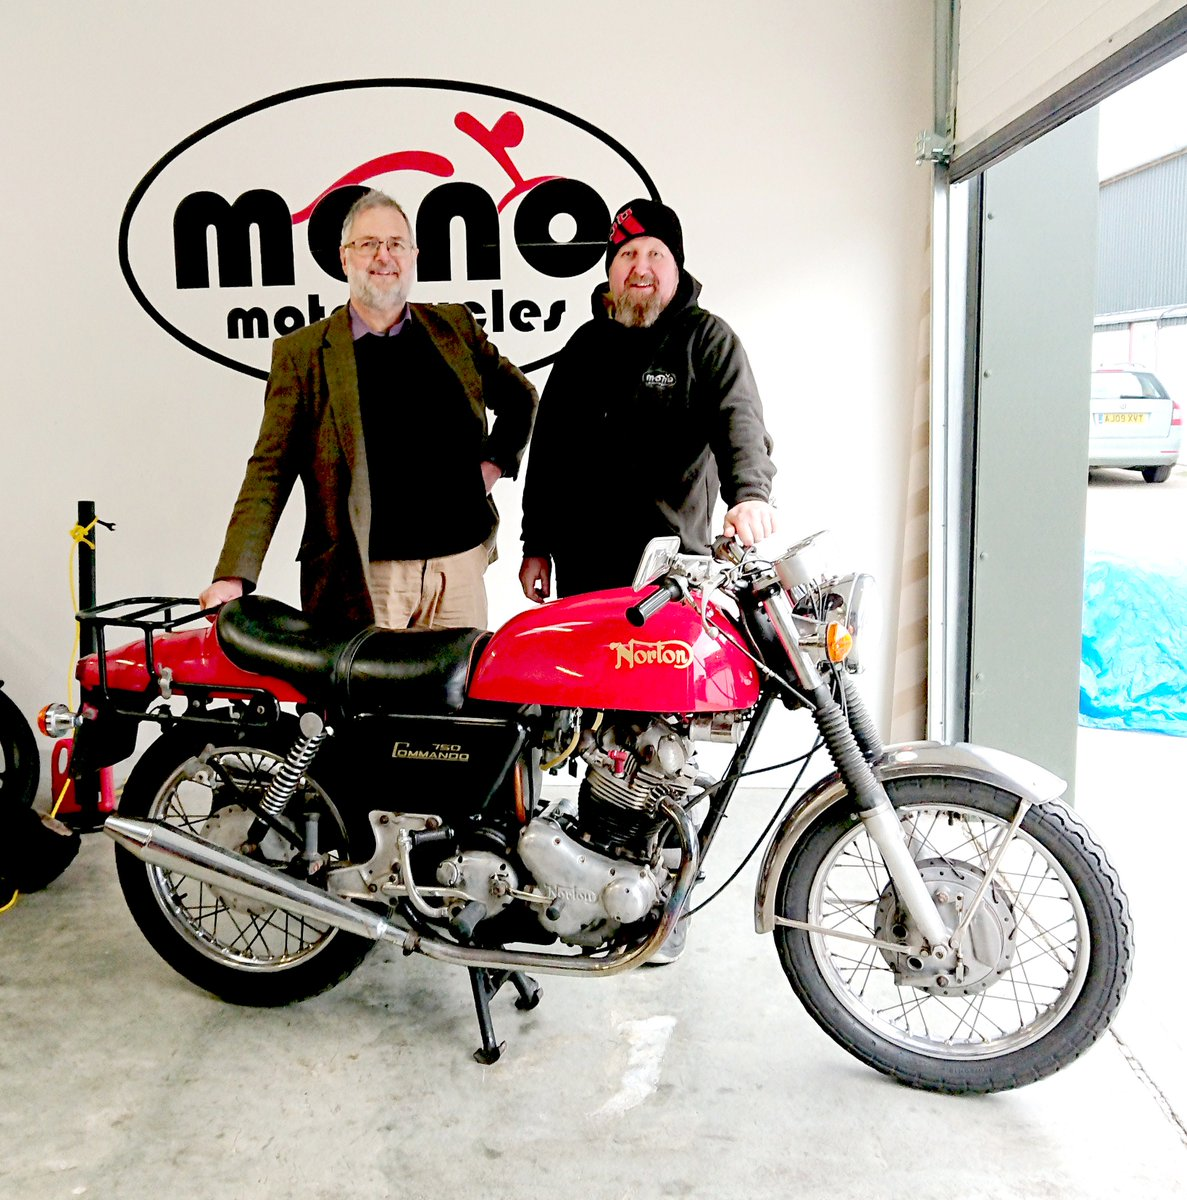 mono motorcycles on Twitter: